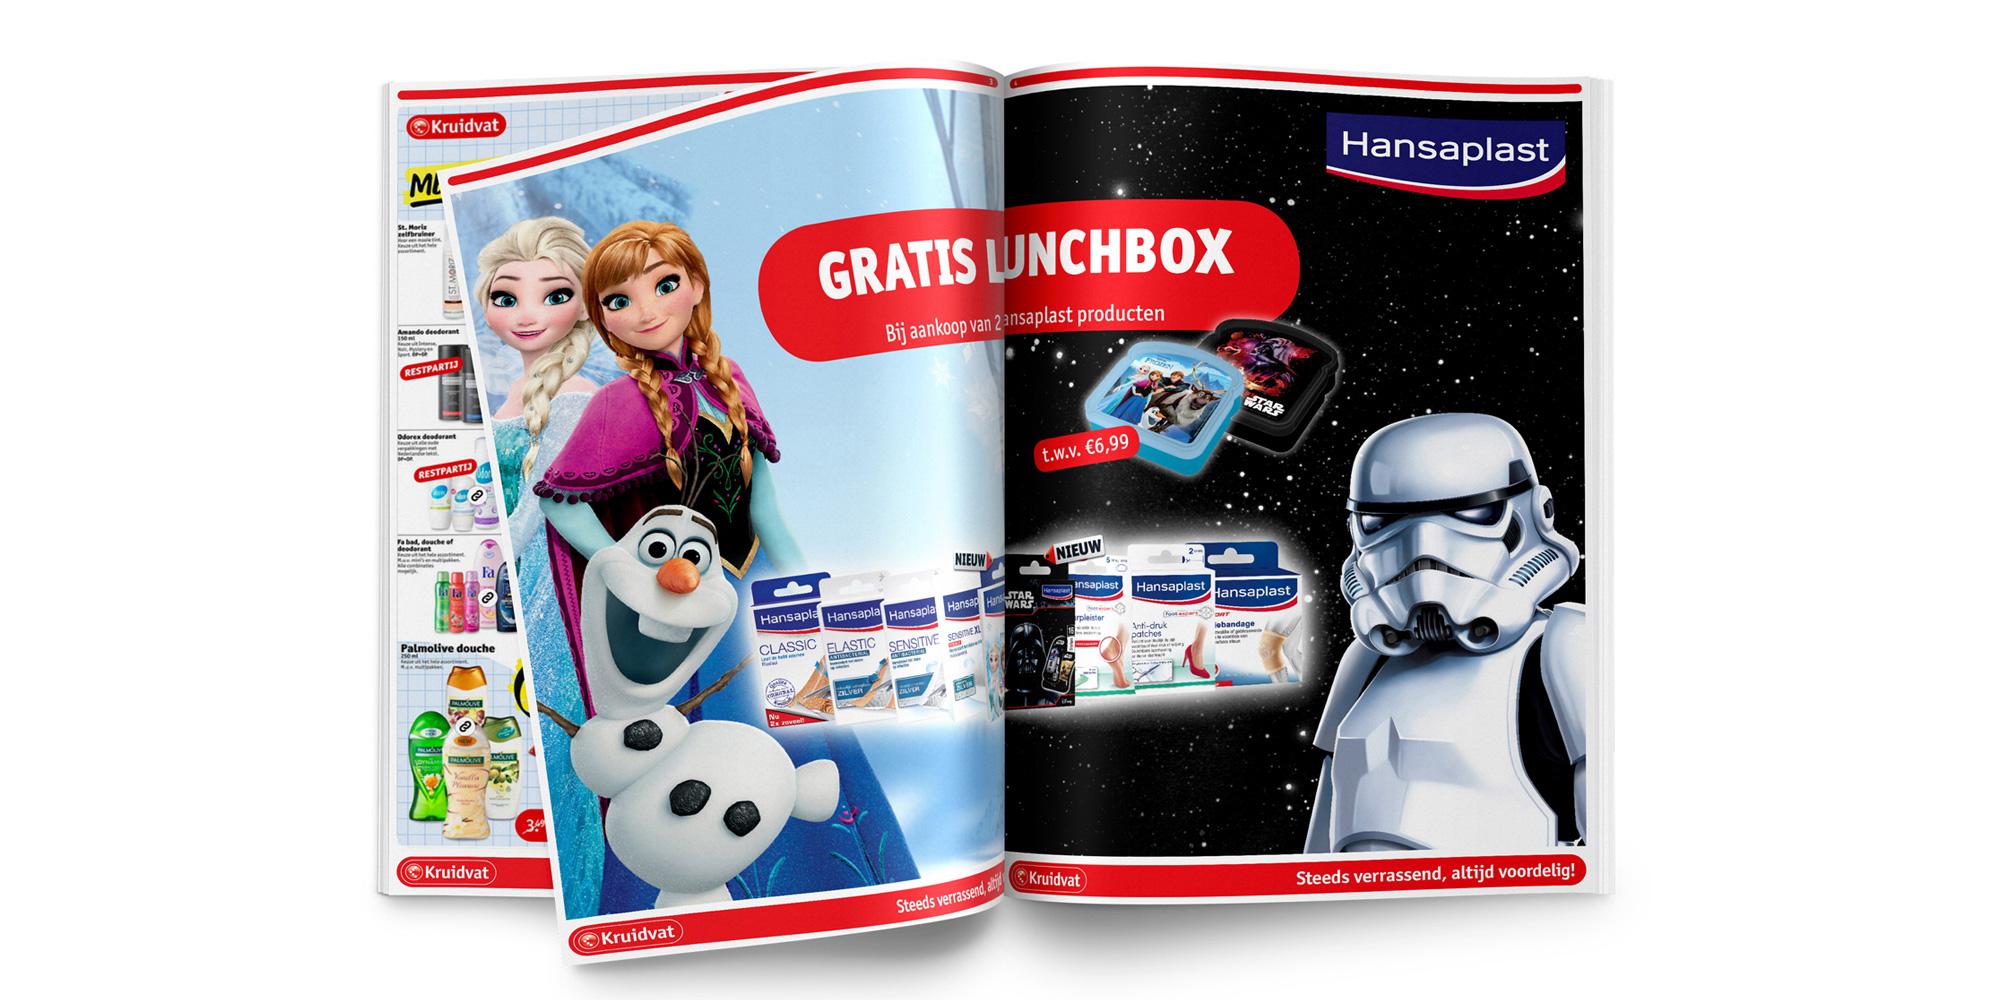 Hansaplast / Dutchy Design / Branding & Design Portfolio